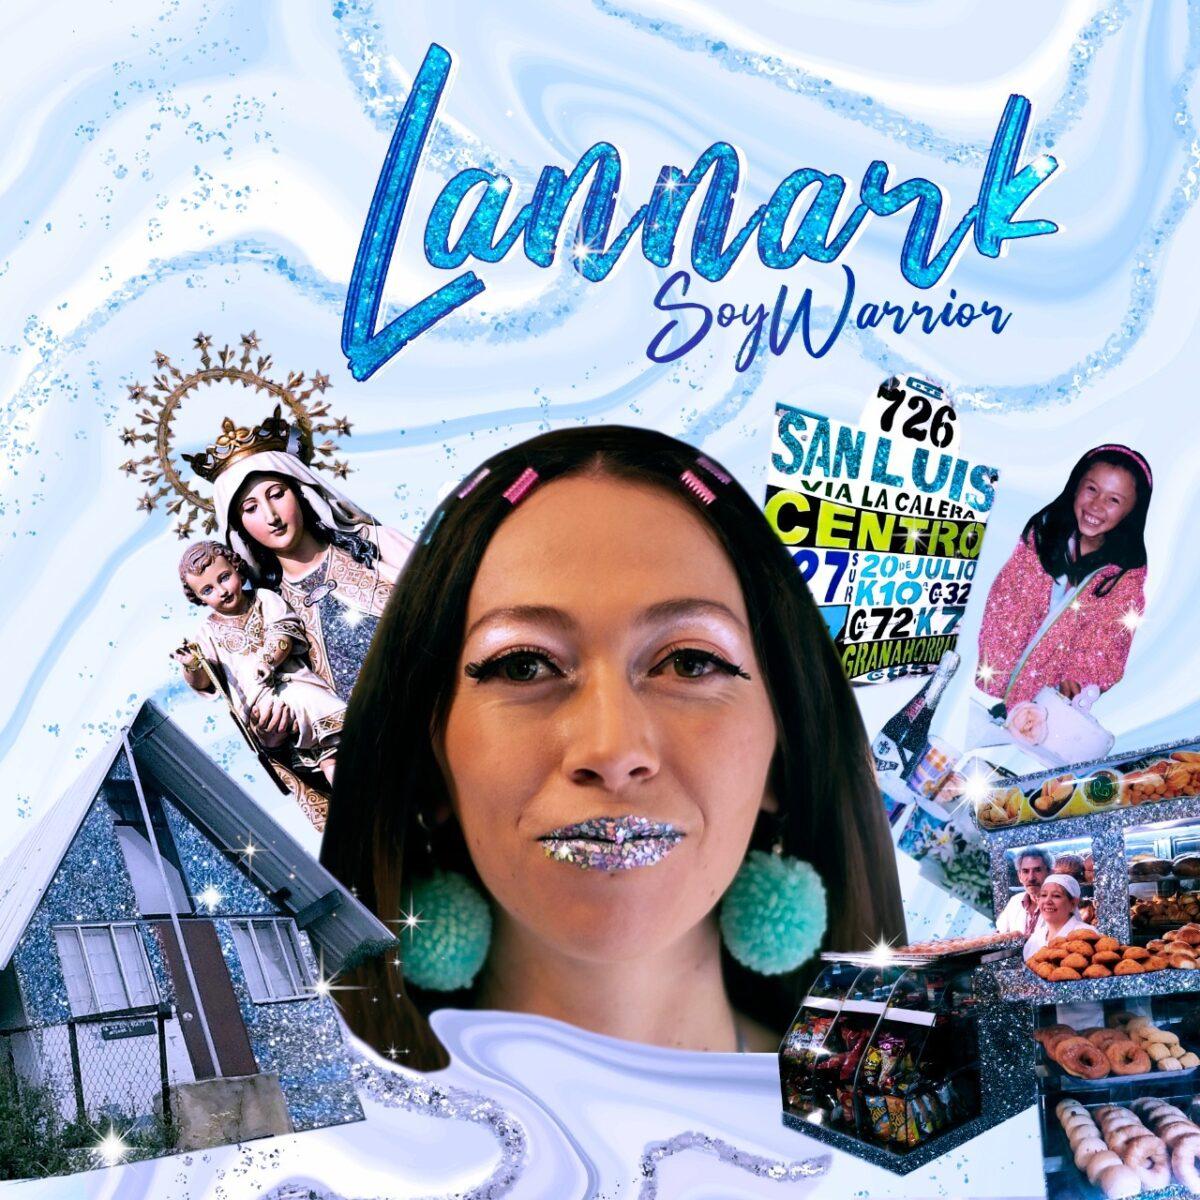 lannark lanza soy warrior lannark 3